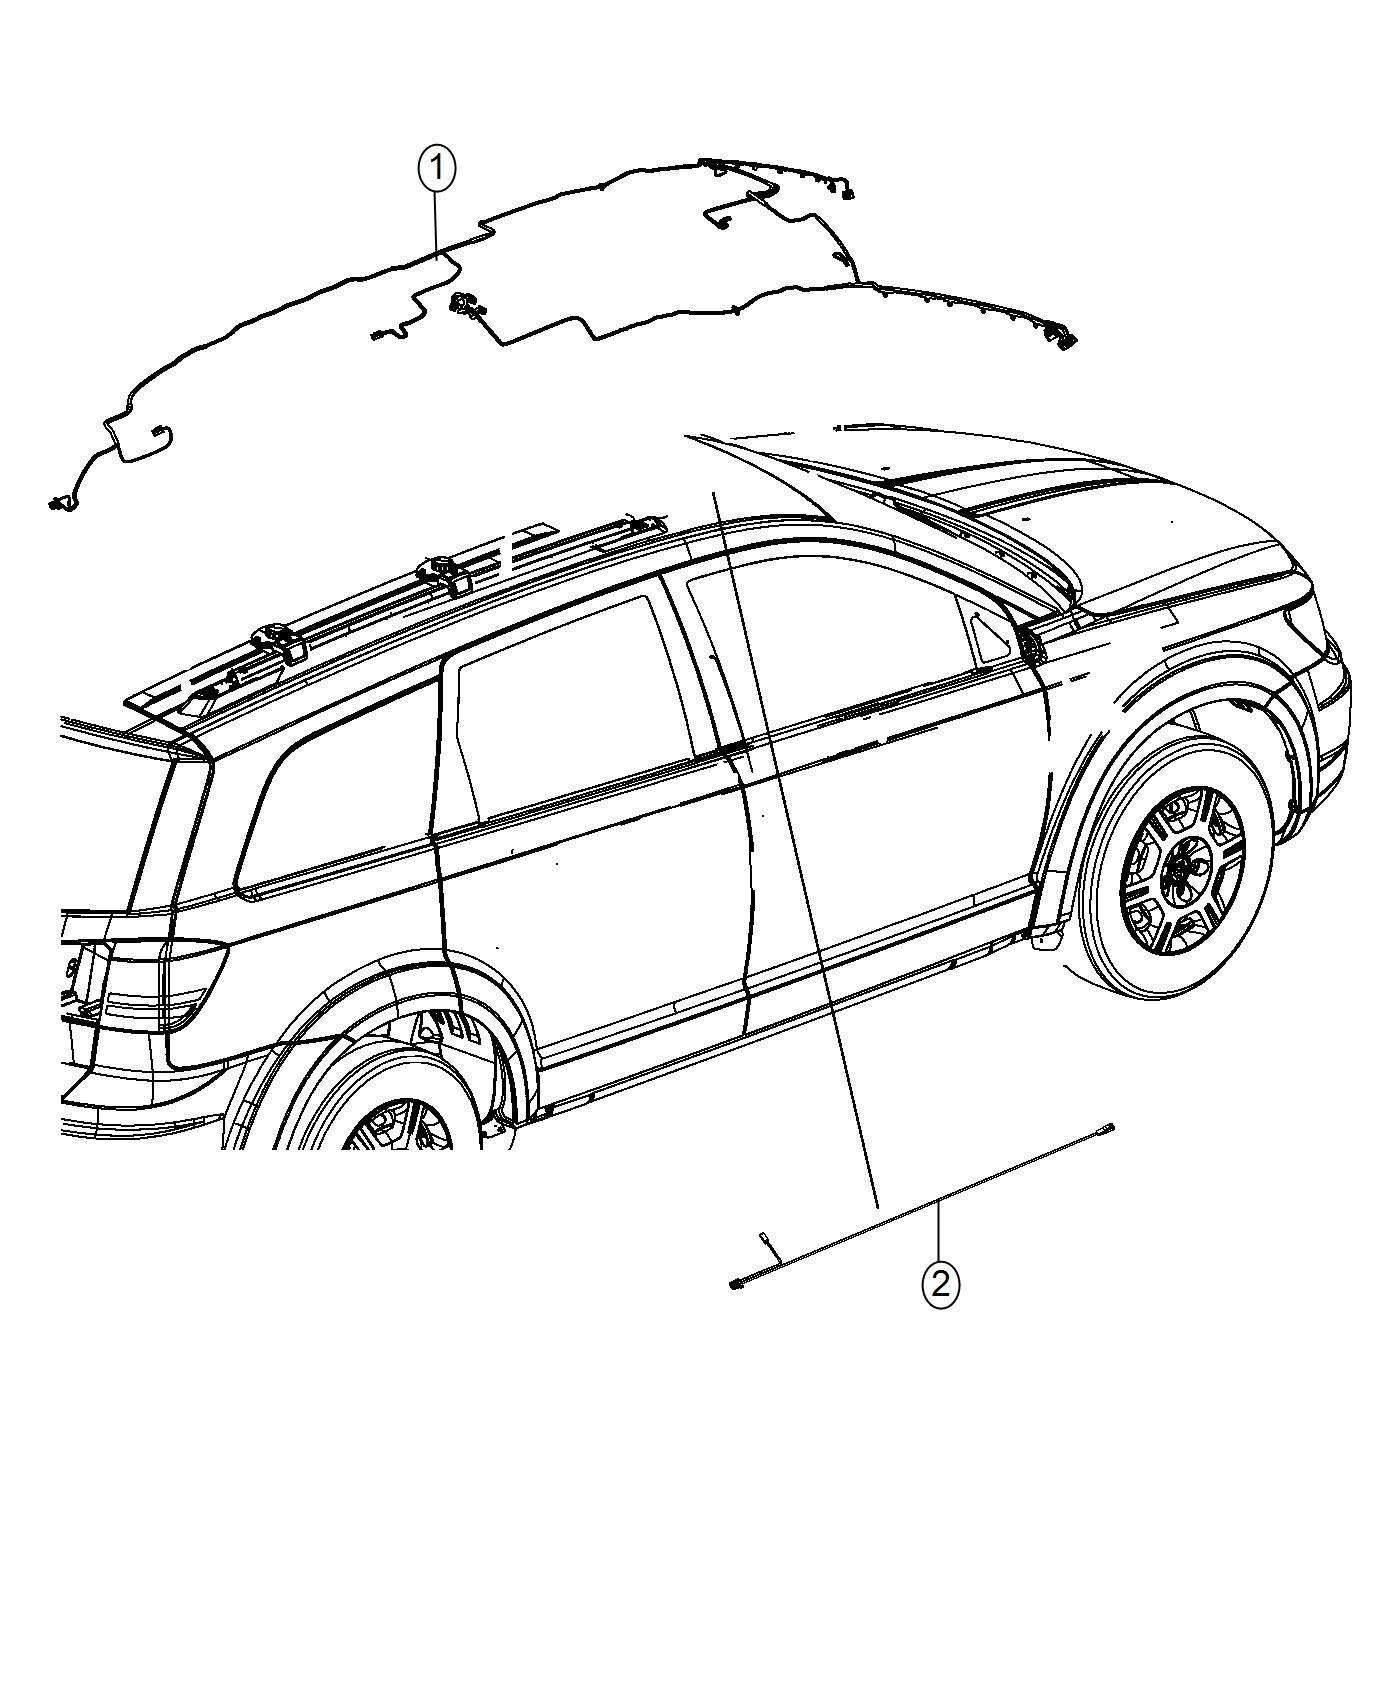 2017 Dodge Journey Wiring. Header. Us, canada. [rr view